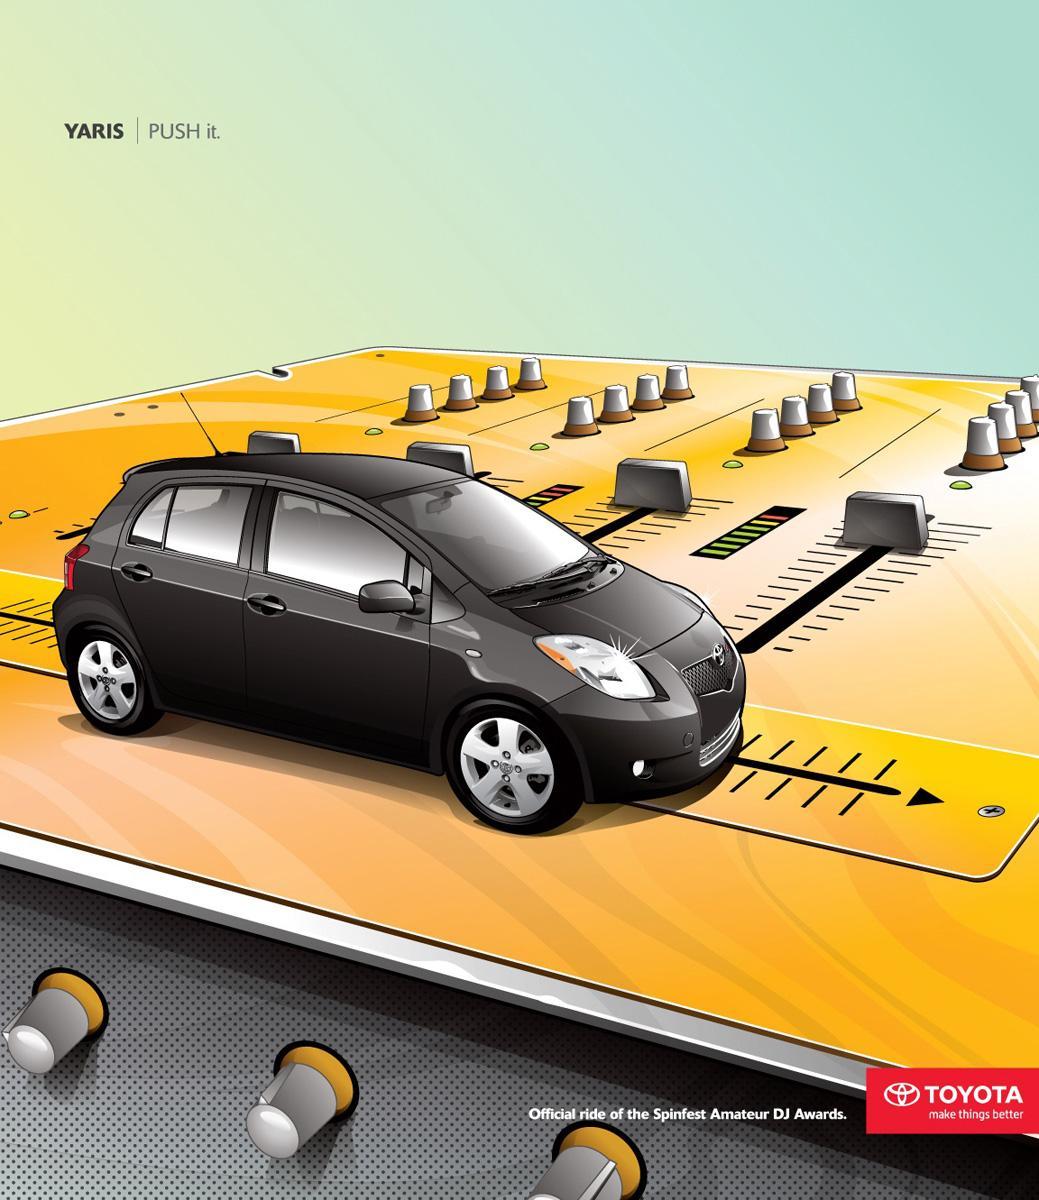 Toyota Print Ad -  Push